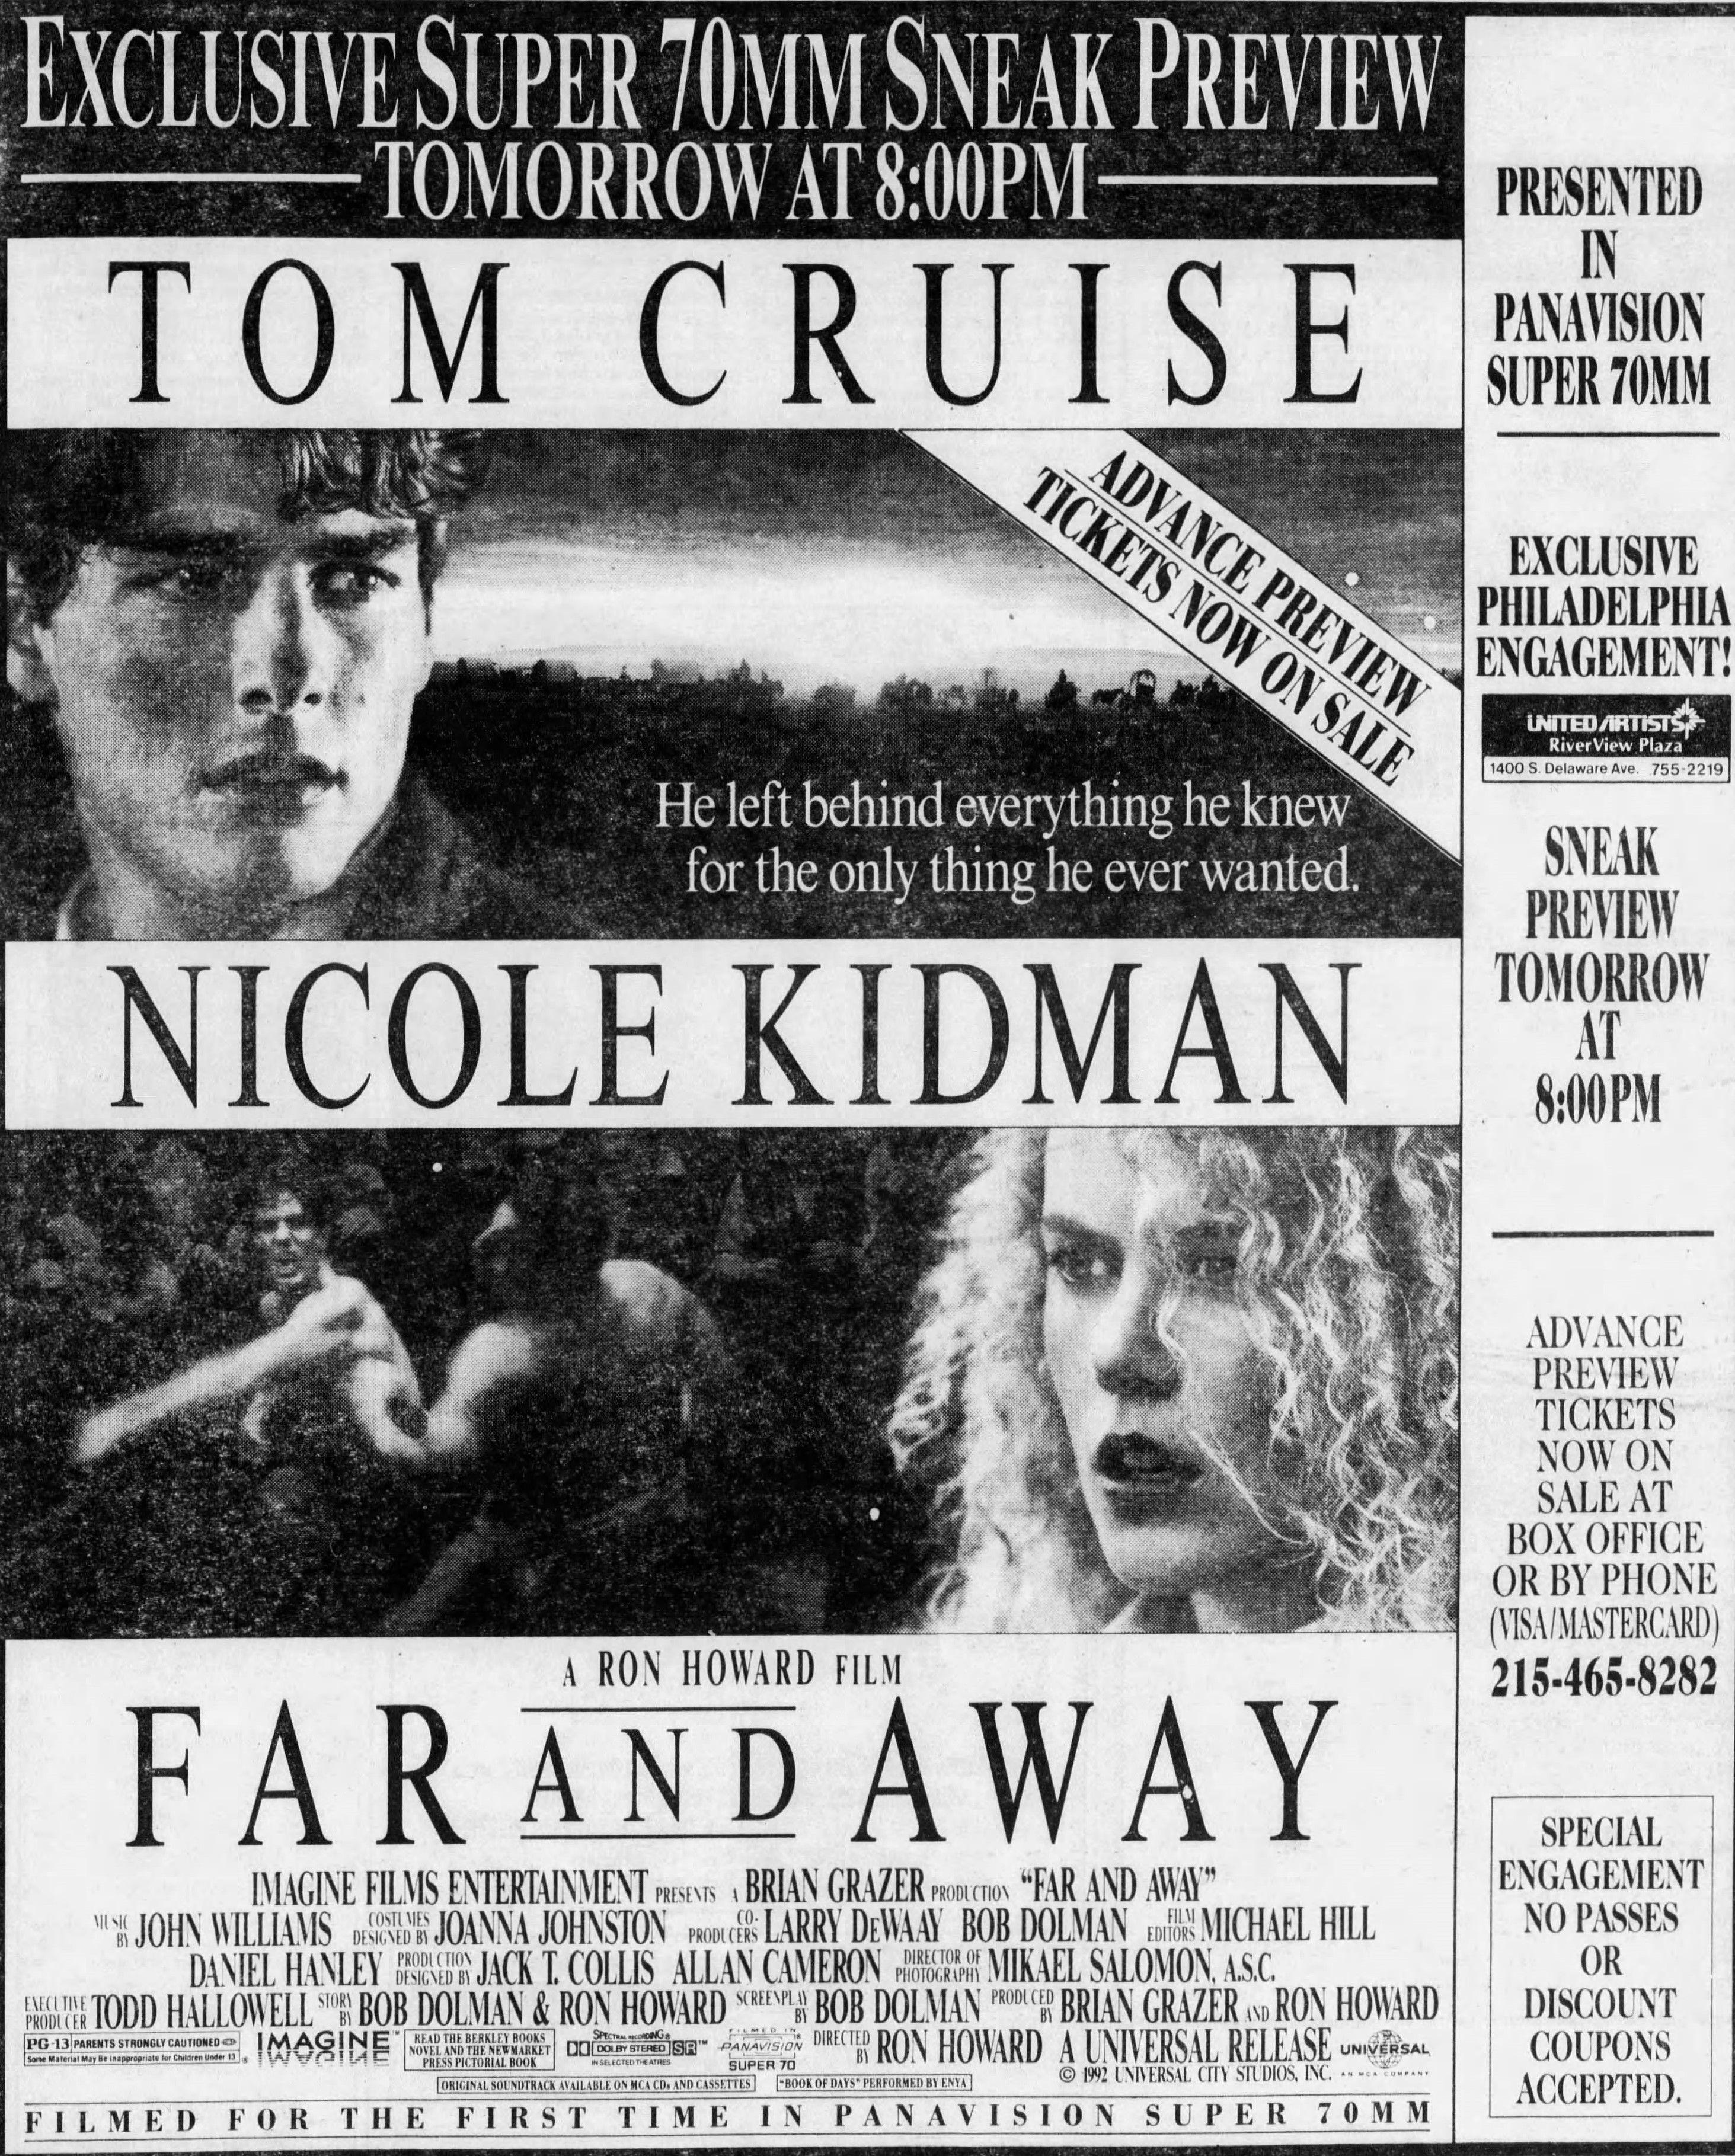 Far And Away 1992 Tom Cruise Movies Tom Cruise Nicole Kidman